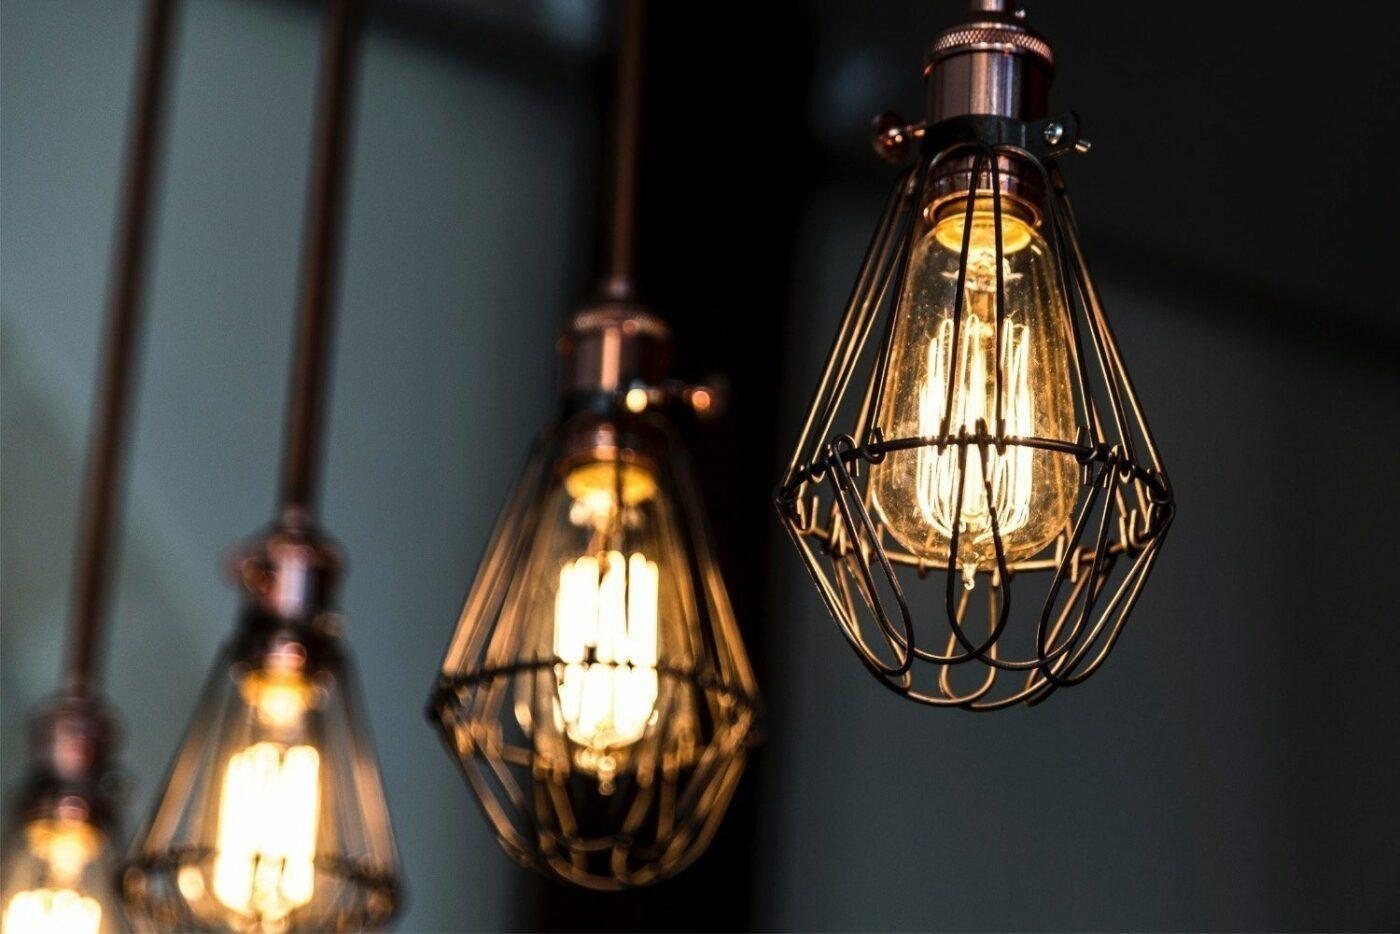 Metall-Lampe im Vintage-Stil